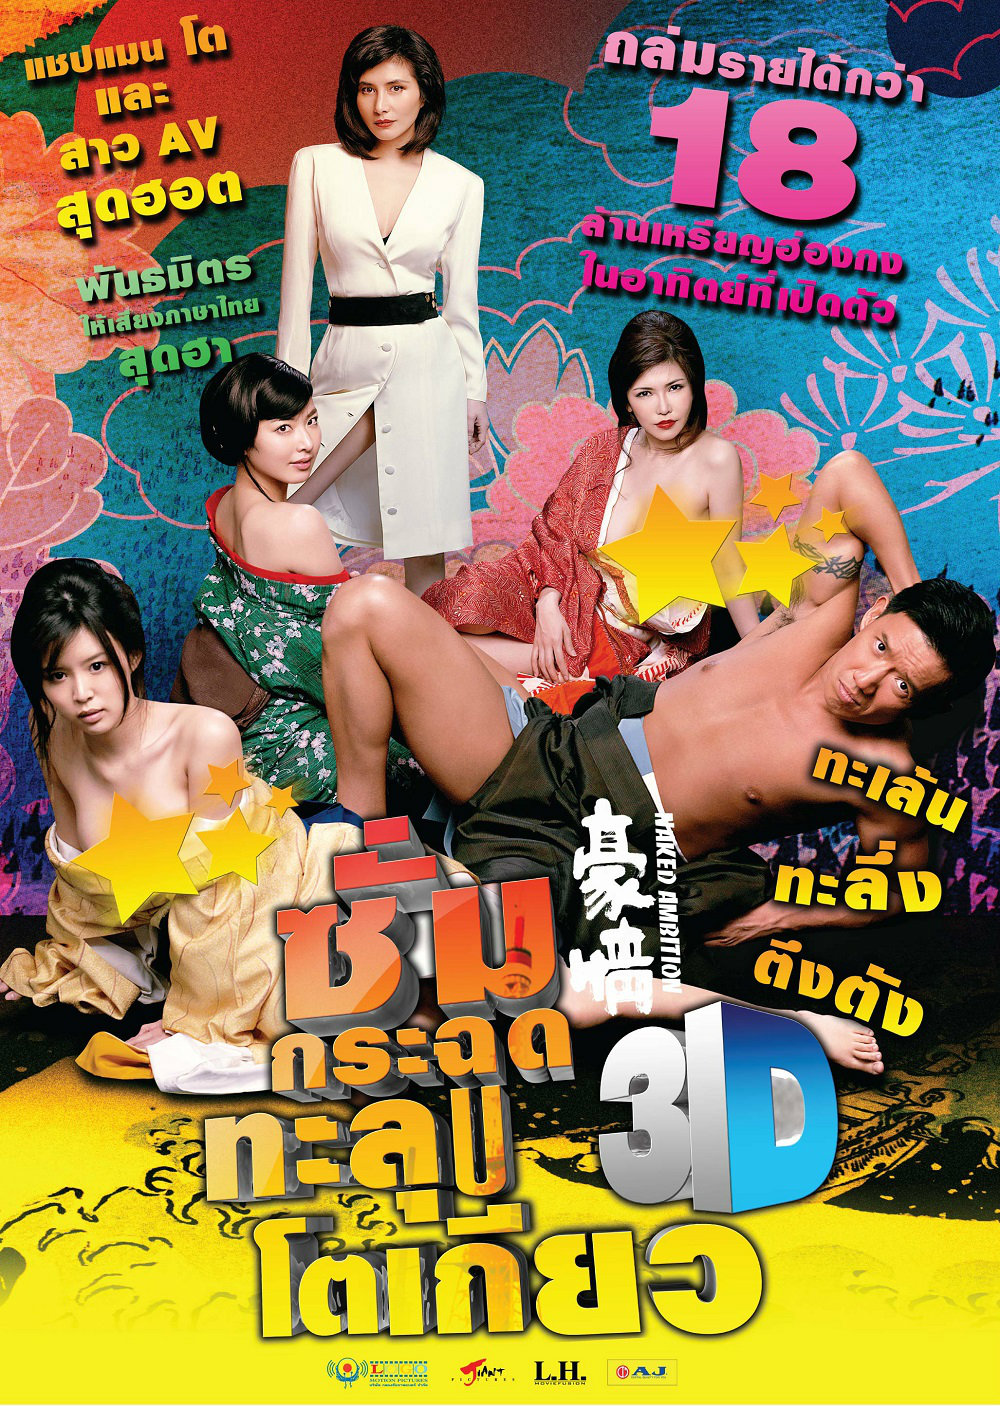 Naked Ambition2 3D ซั่มกระฉูด ทะลุโตเกียว